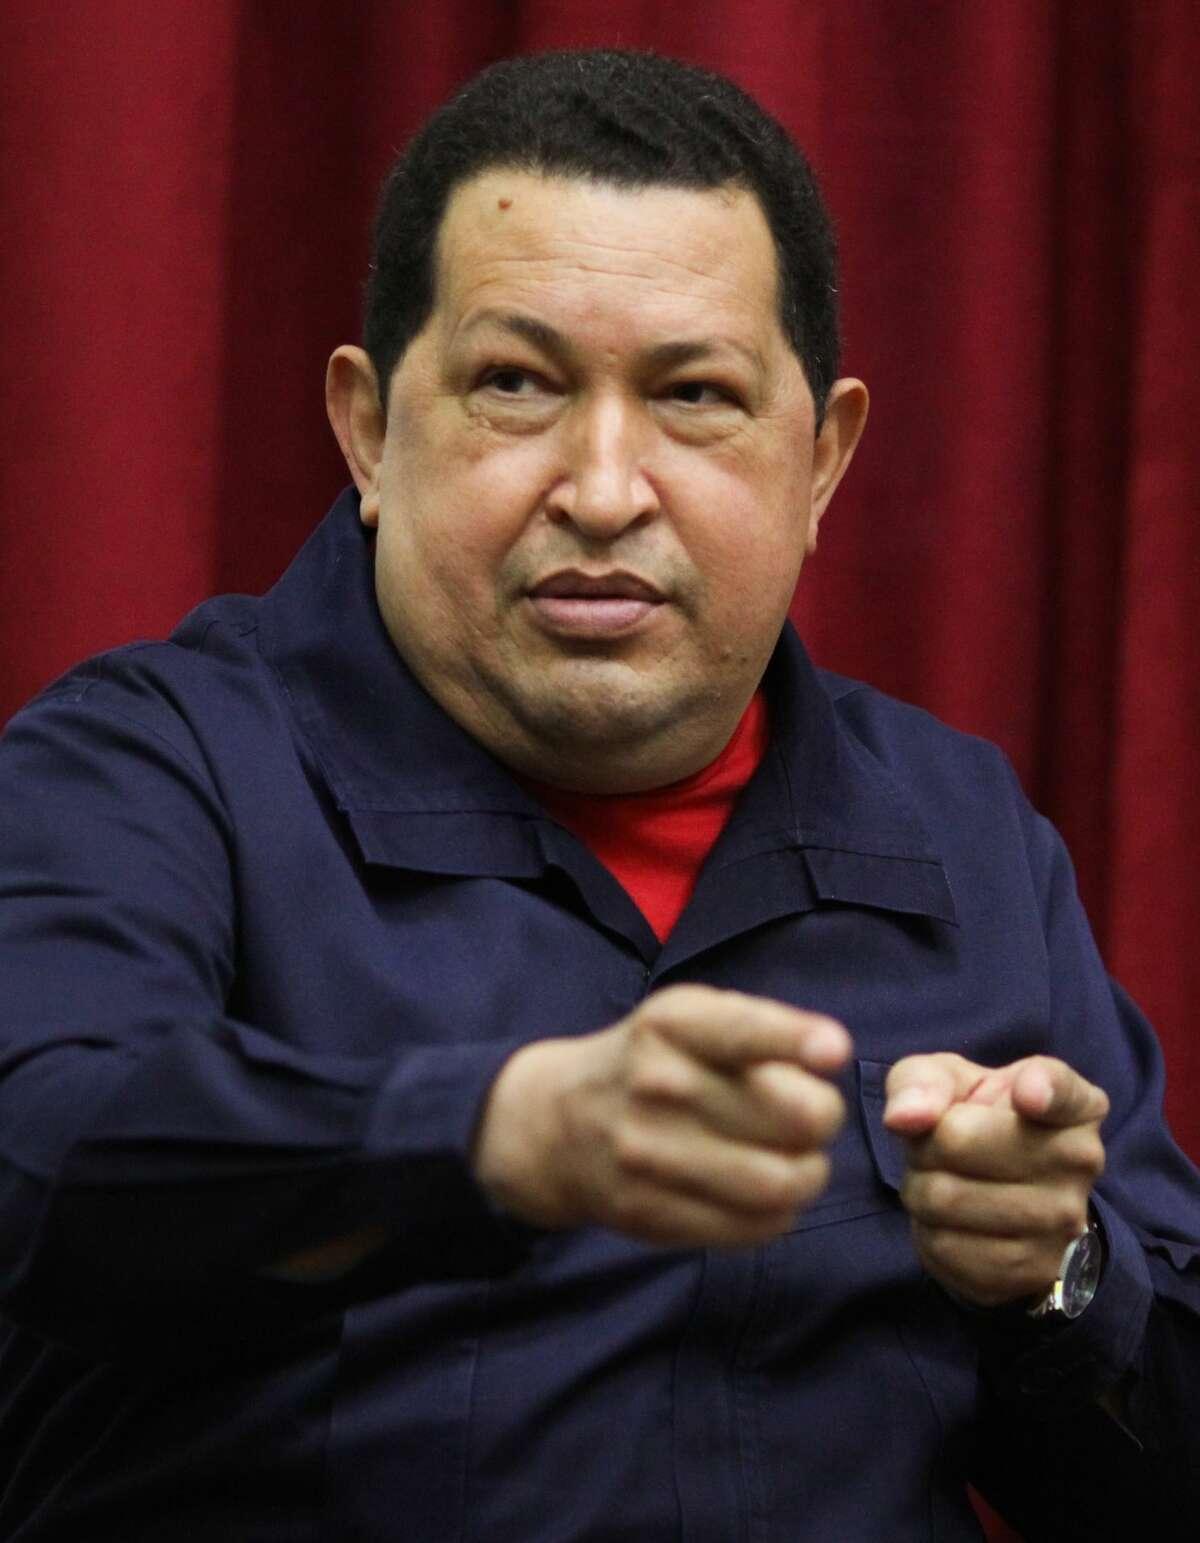 Venezuela's President Hugo Chavez speaks during a televised program from the Miraflores presidential palace in Caracas, Venezuela.